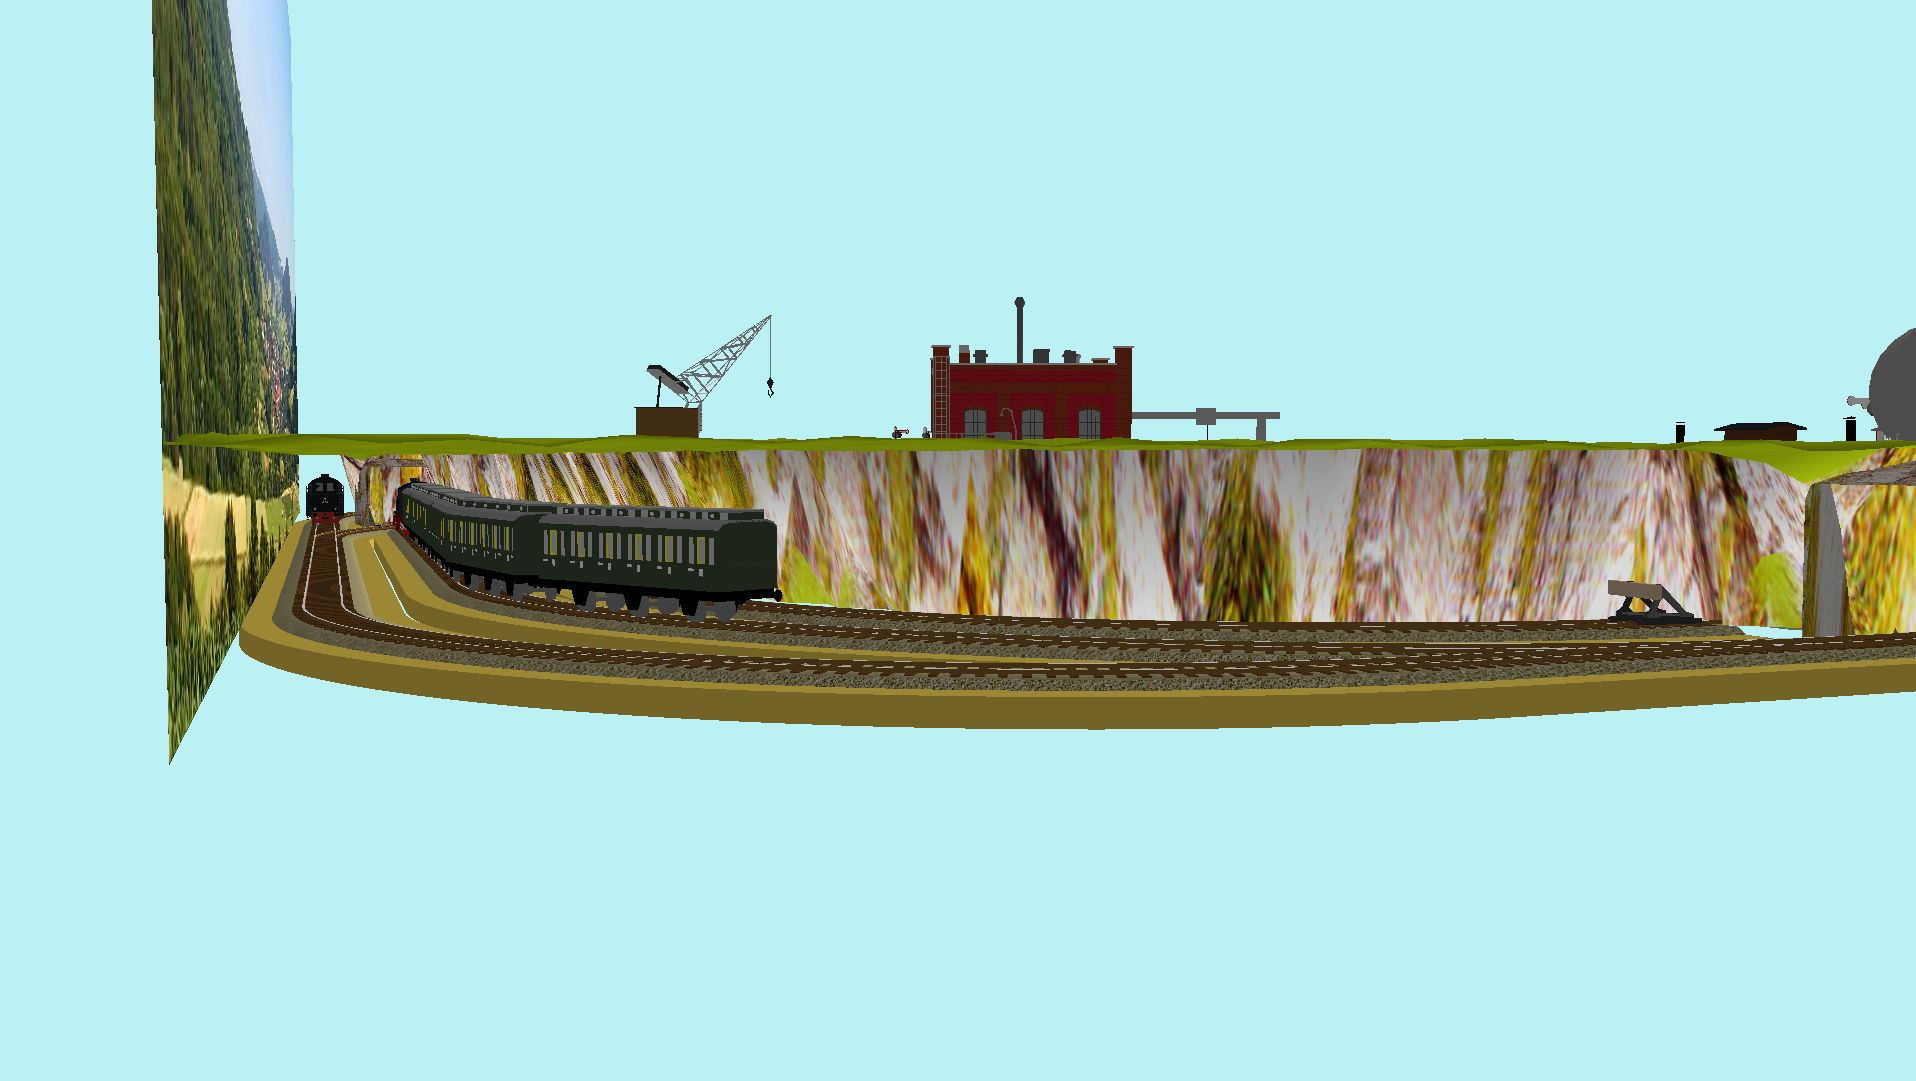 'ALBA Modellbahnpraxis' Band 1, Plan 5 Amp-1_5_c-gleis_7awj3g